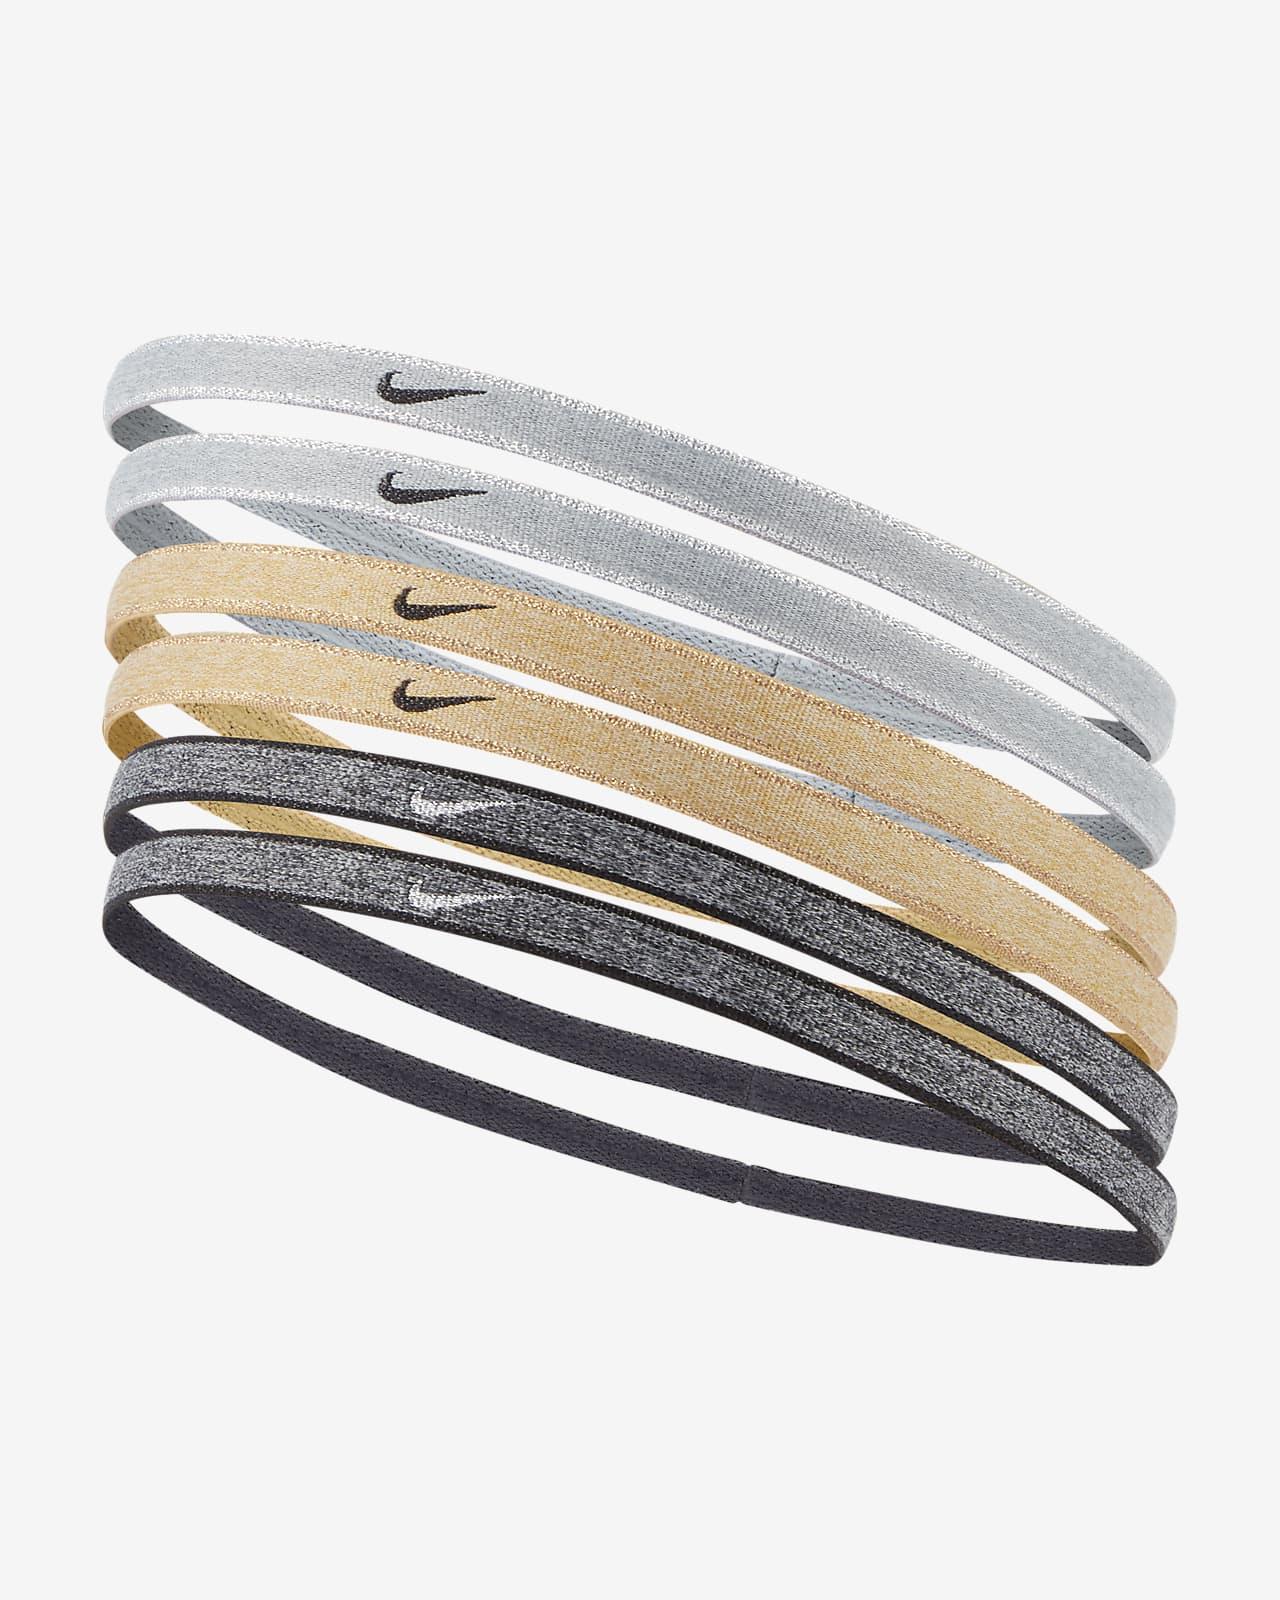 Hårband Nike Swoosh Sport i metallic (6-pack)